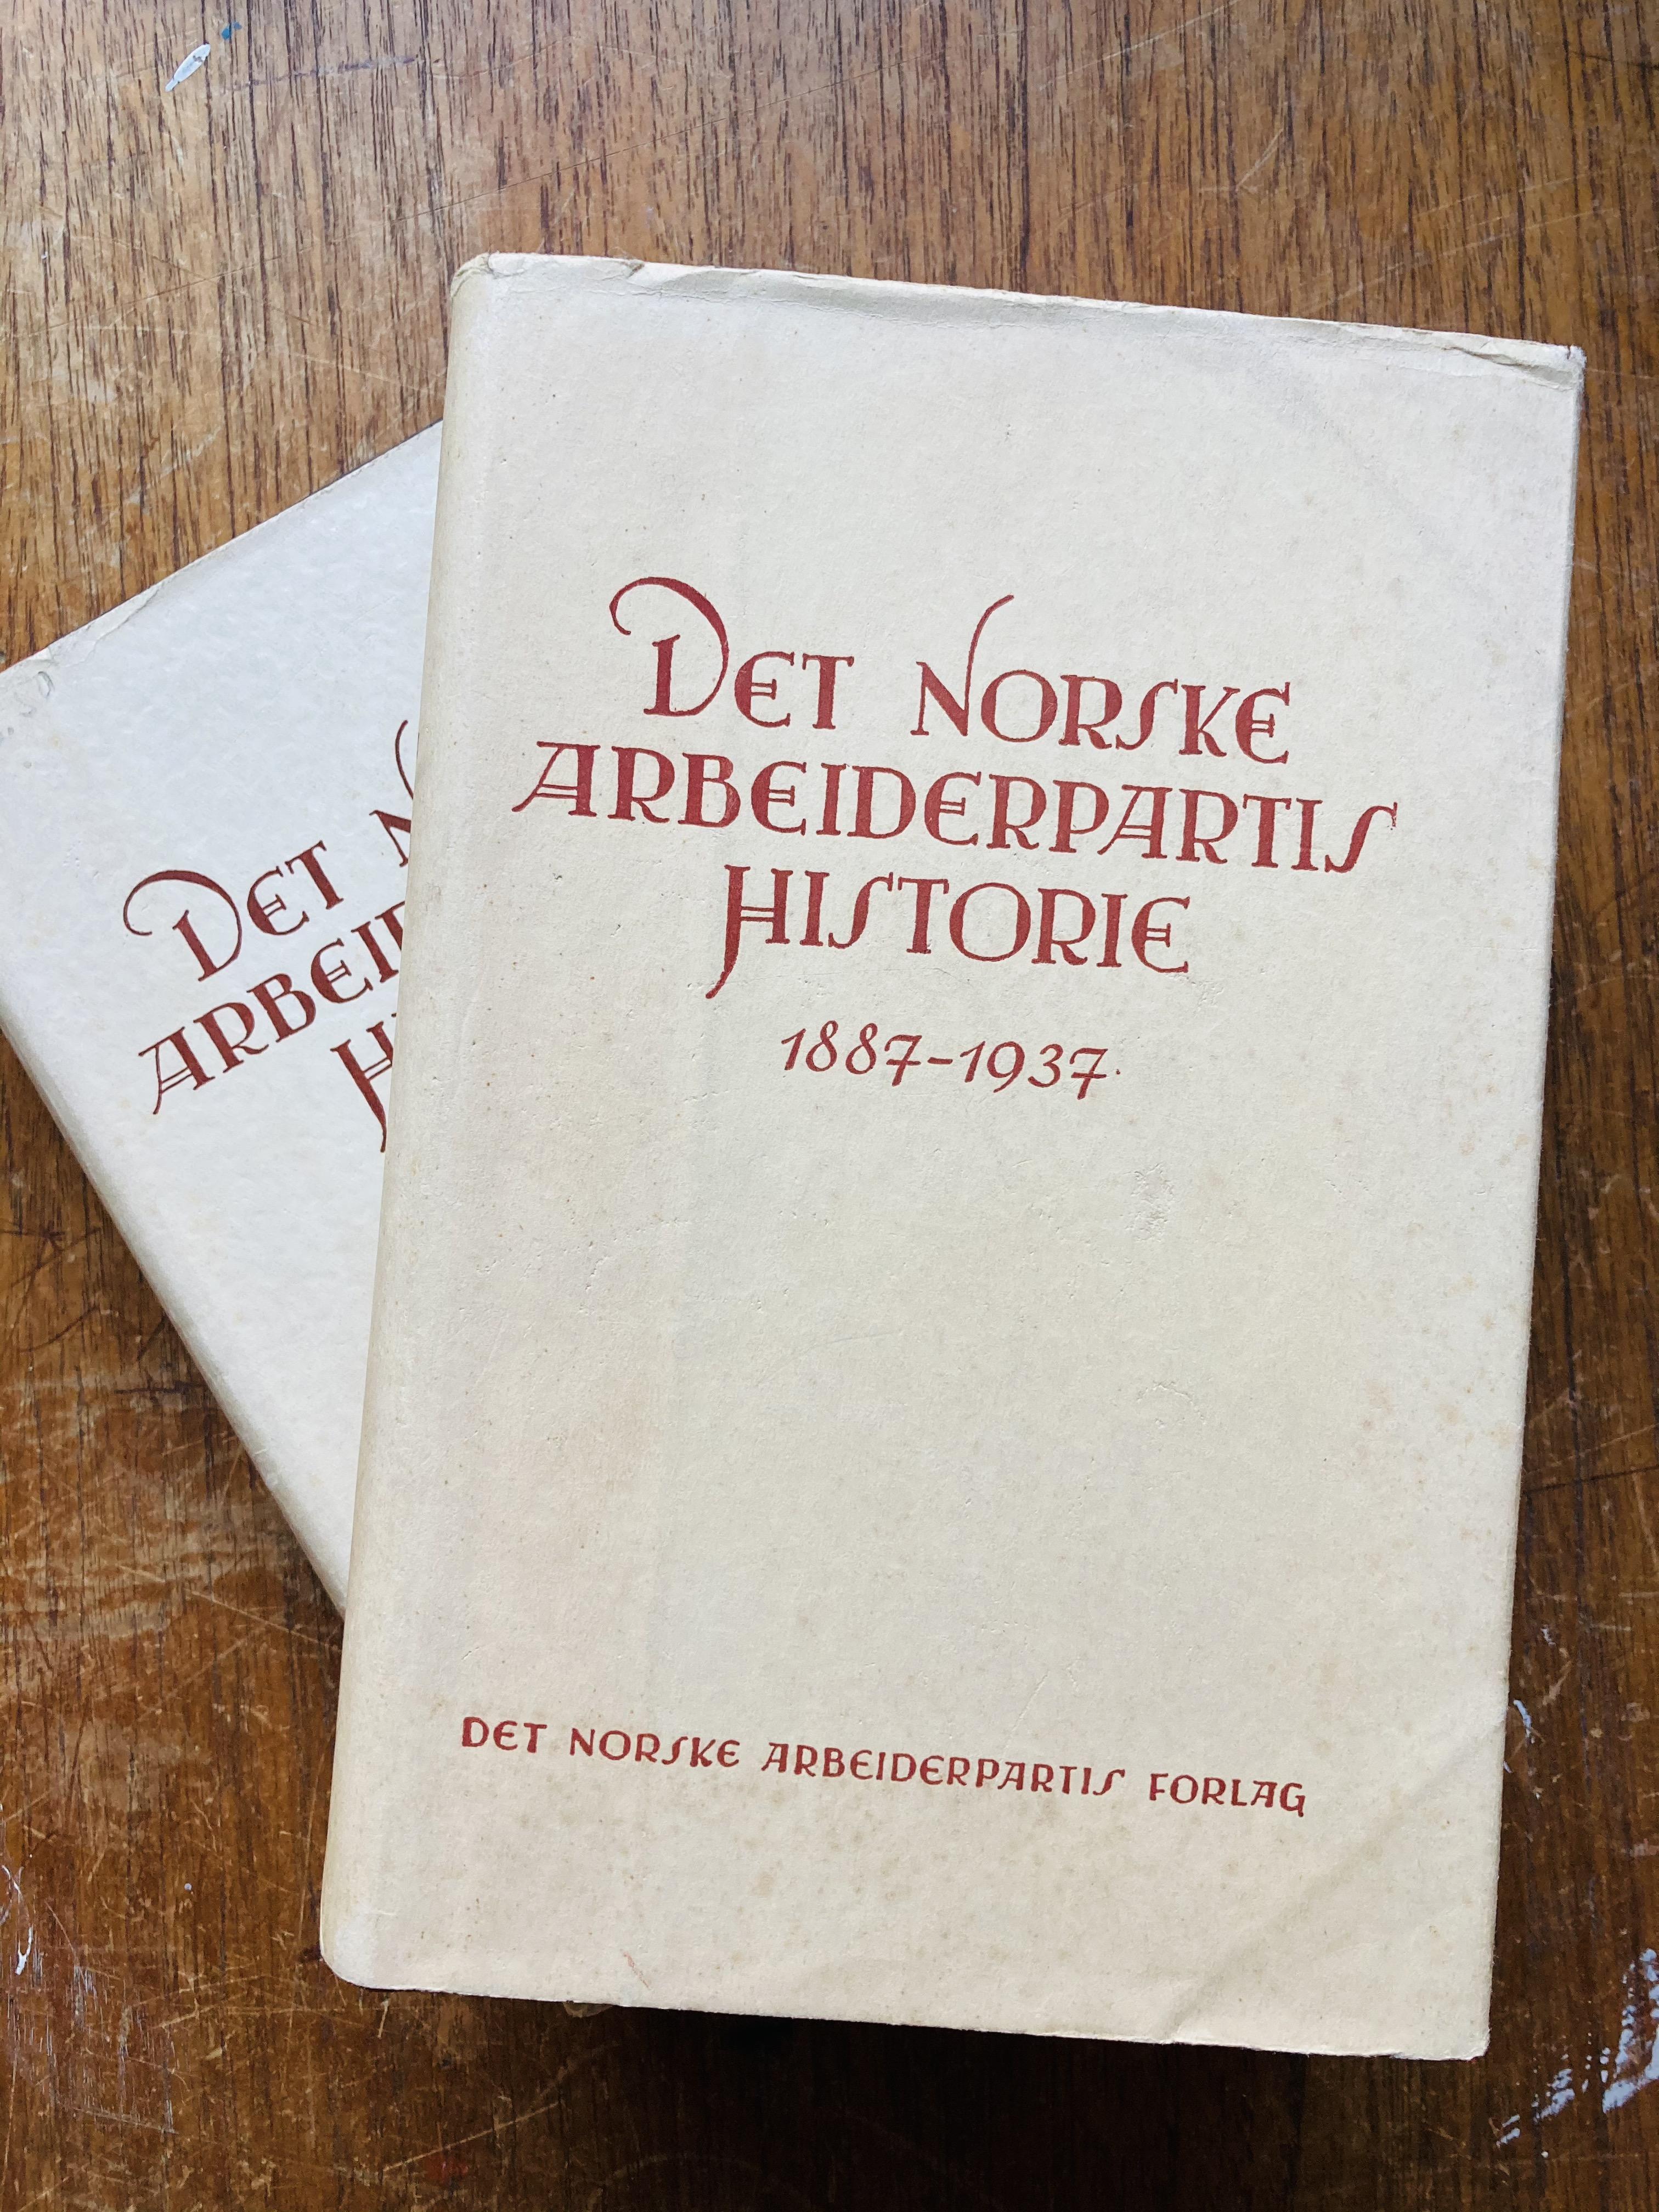 Halvdan Koht (red): Det Norske Arbeiderpartis historie - Bind I-II